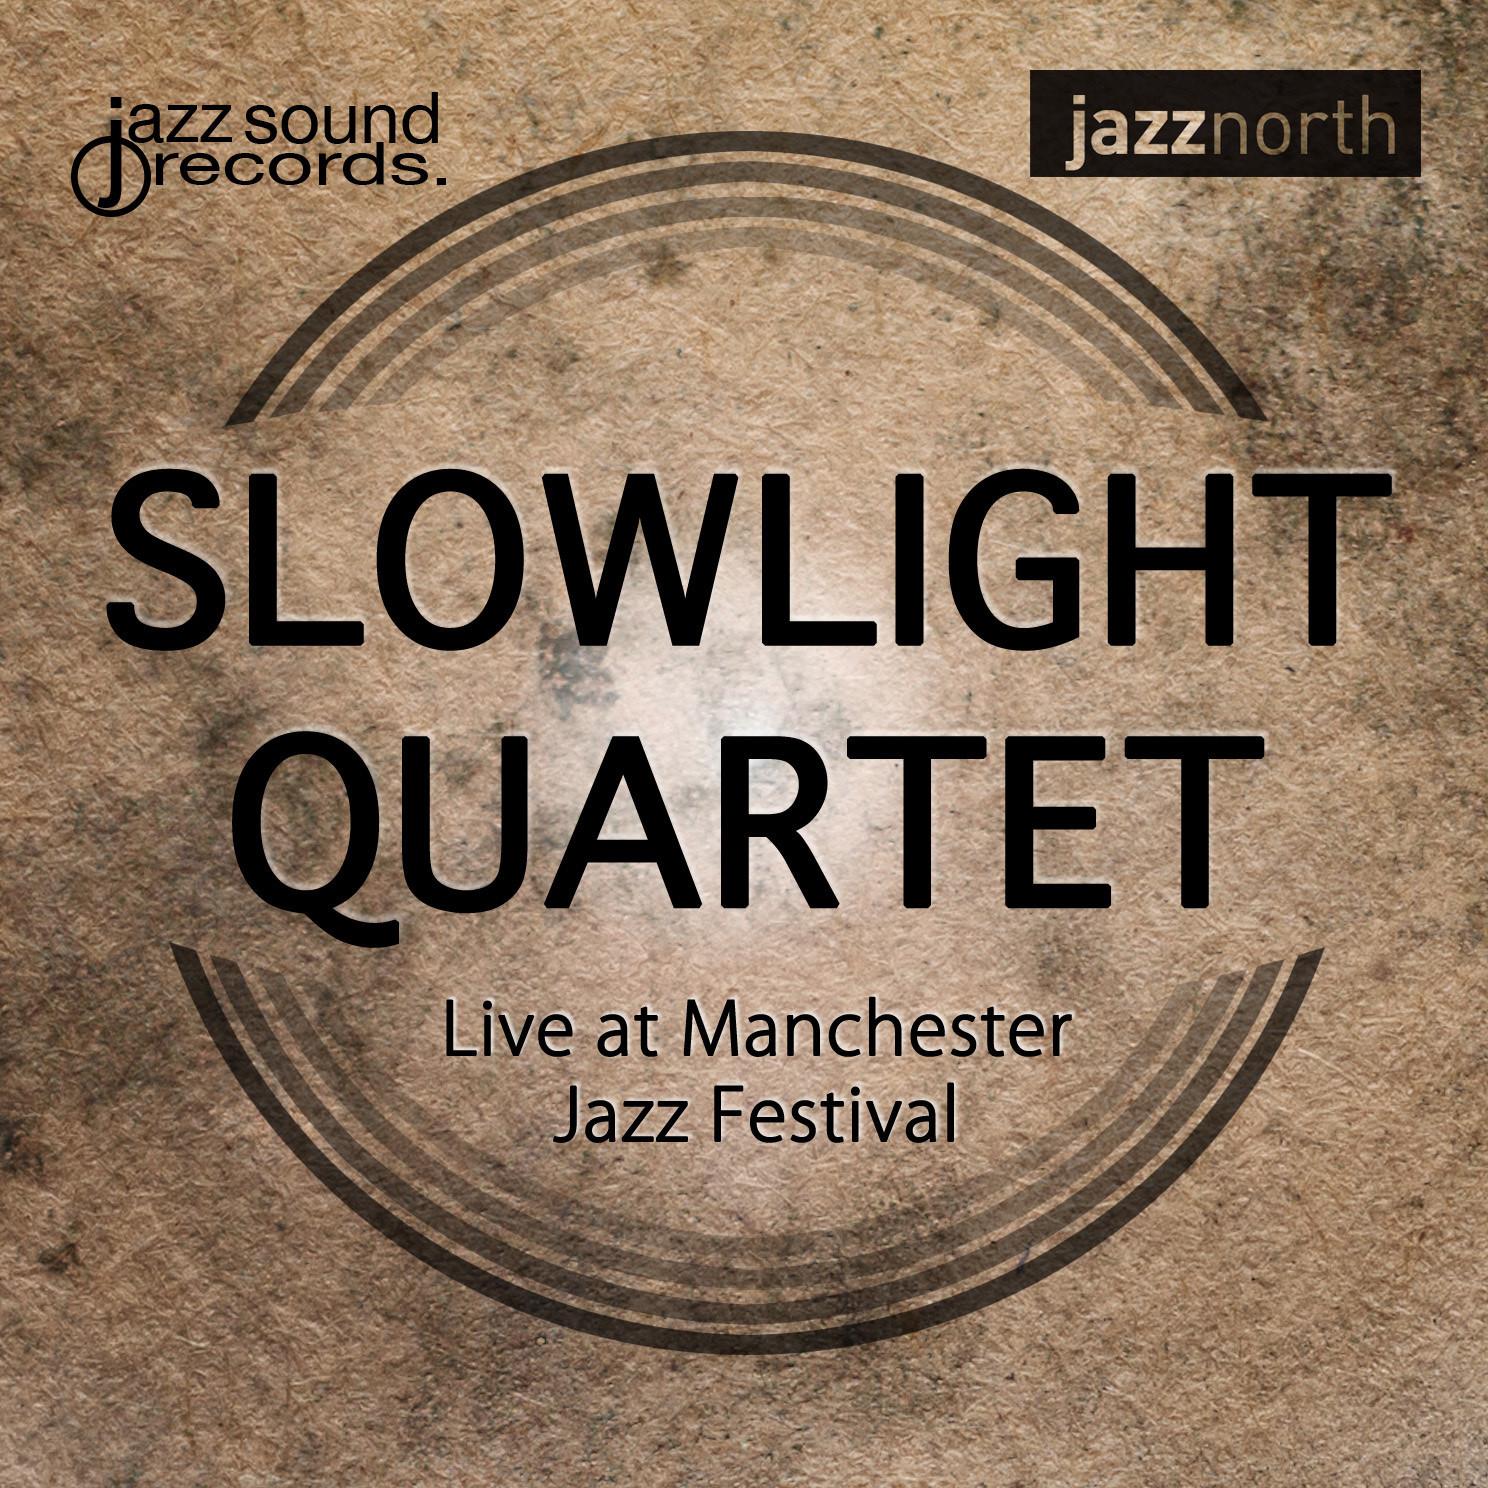 Slowlight Quartet - Live at Manchester Jazz Festival